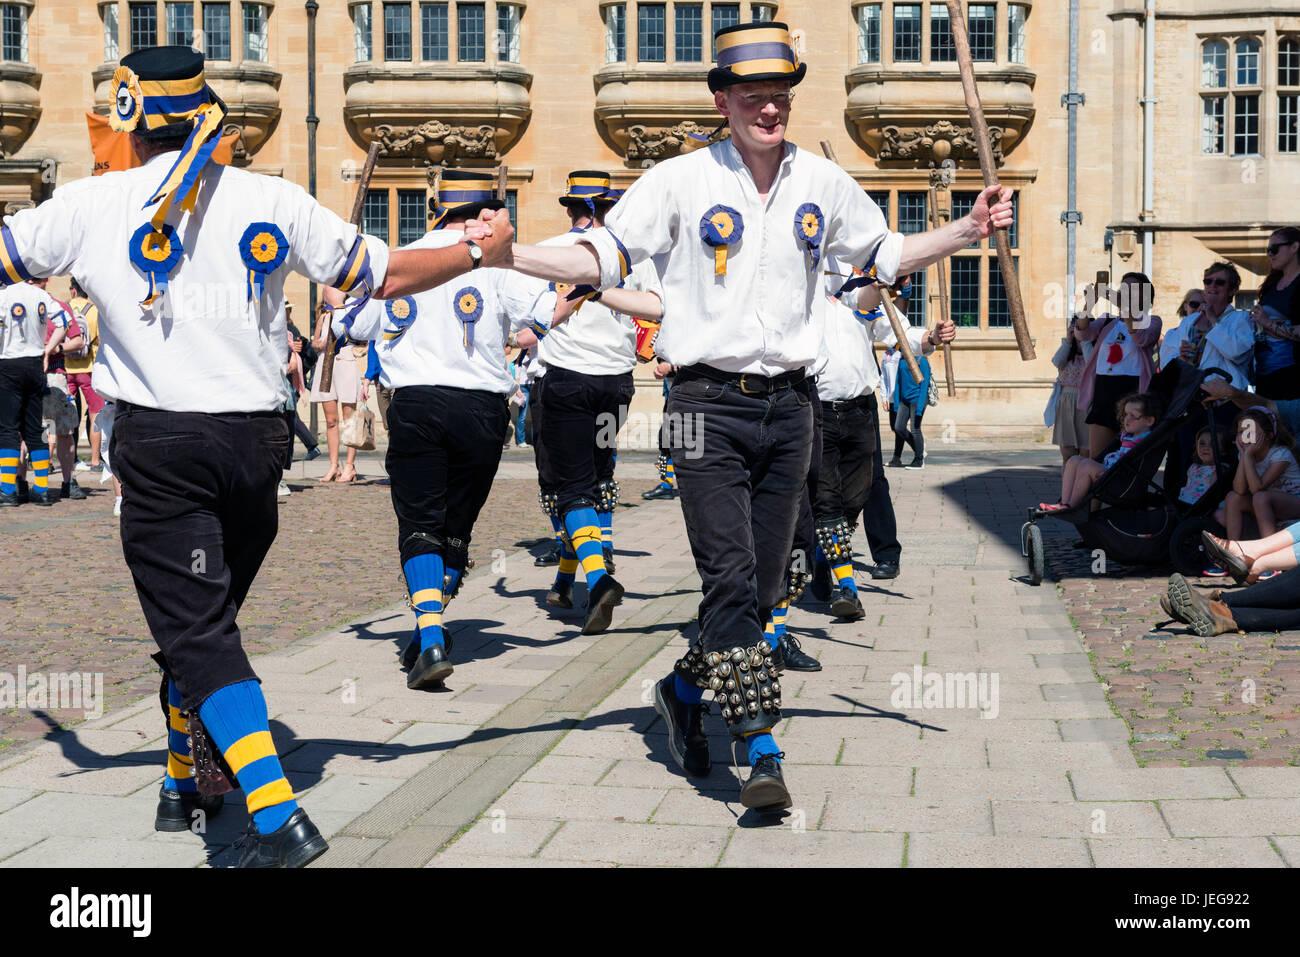 Morris dancing in Oxford City Centre, UK. - Stock Image